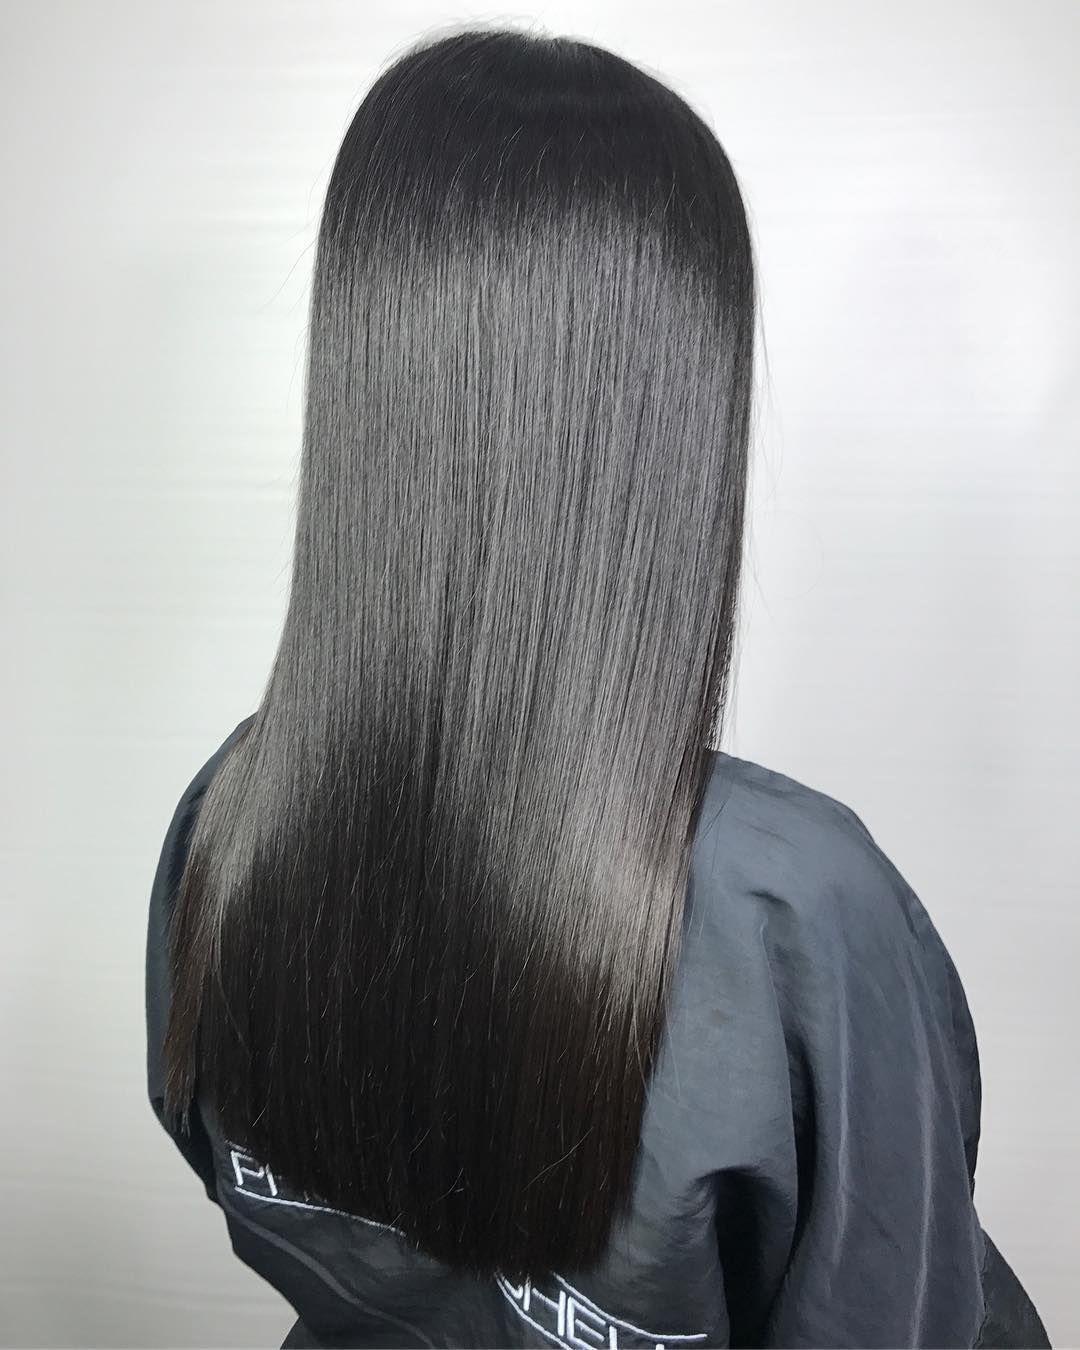 Glossy Locks Ariana S Rocking Her Mirror Smooth Hair Incredible